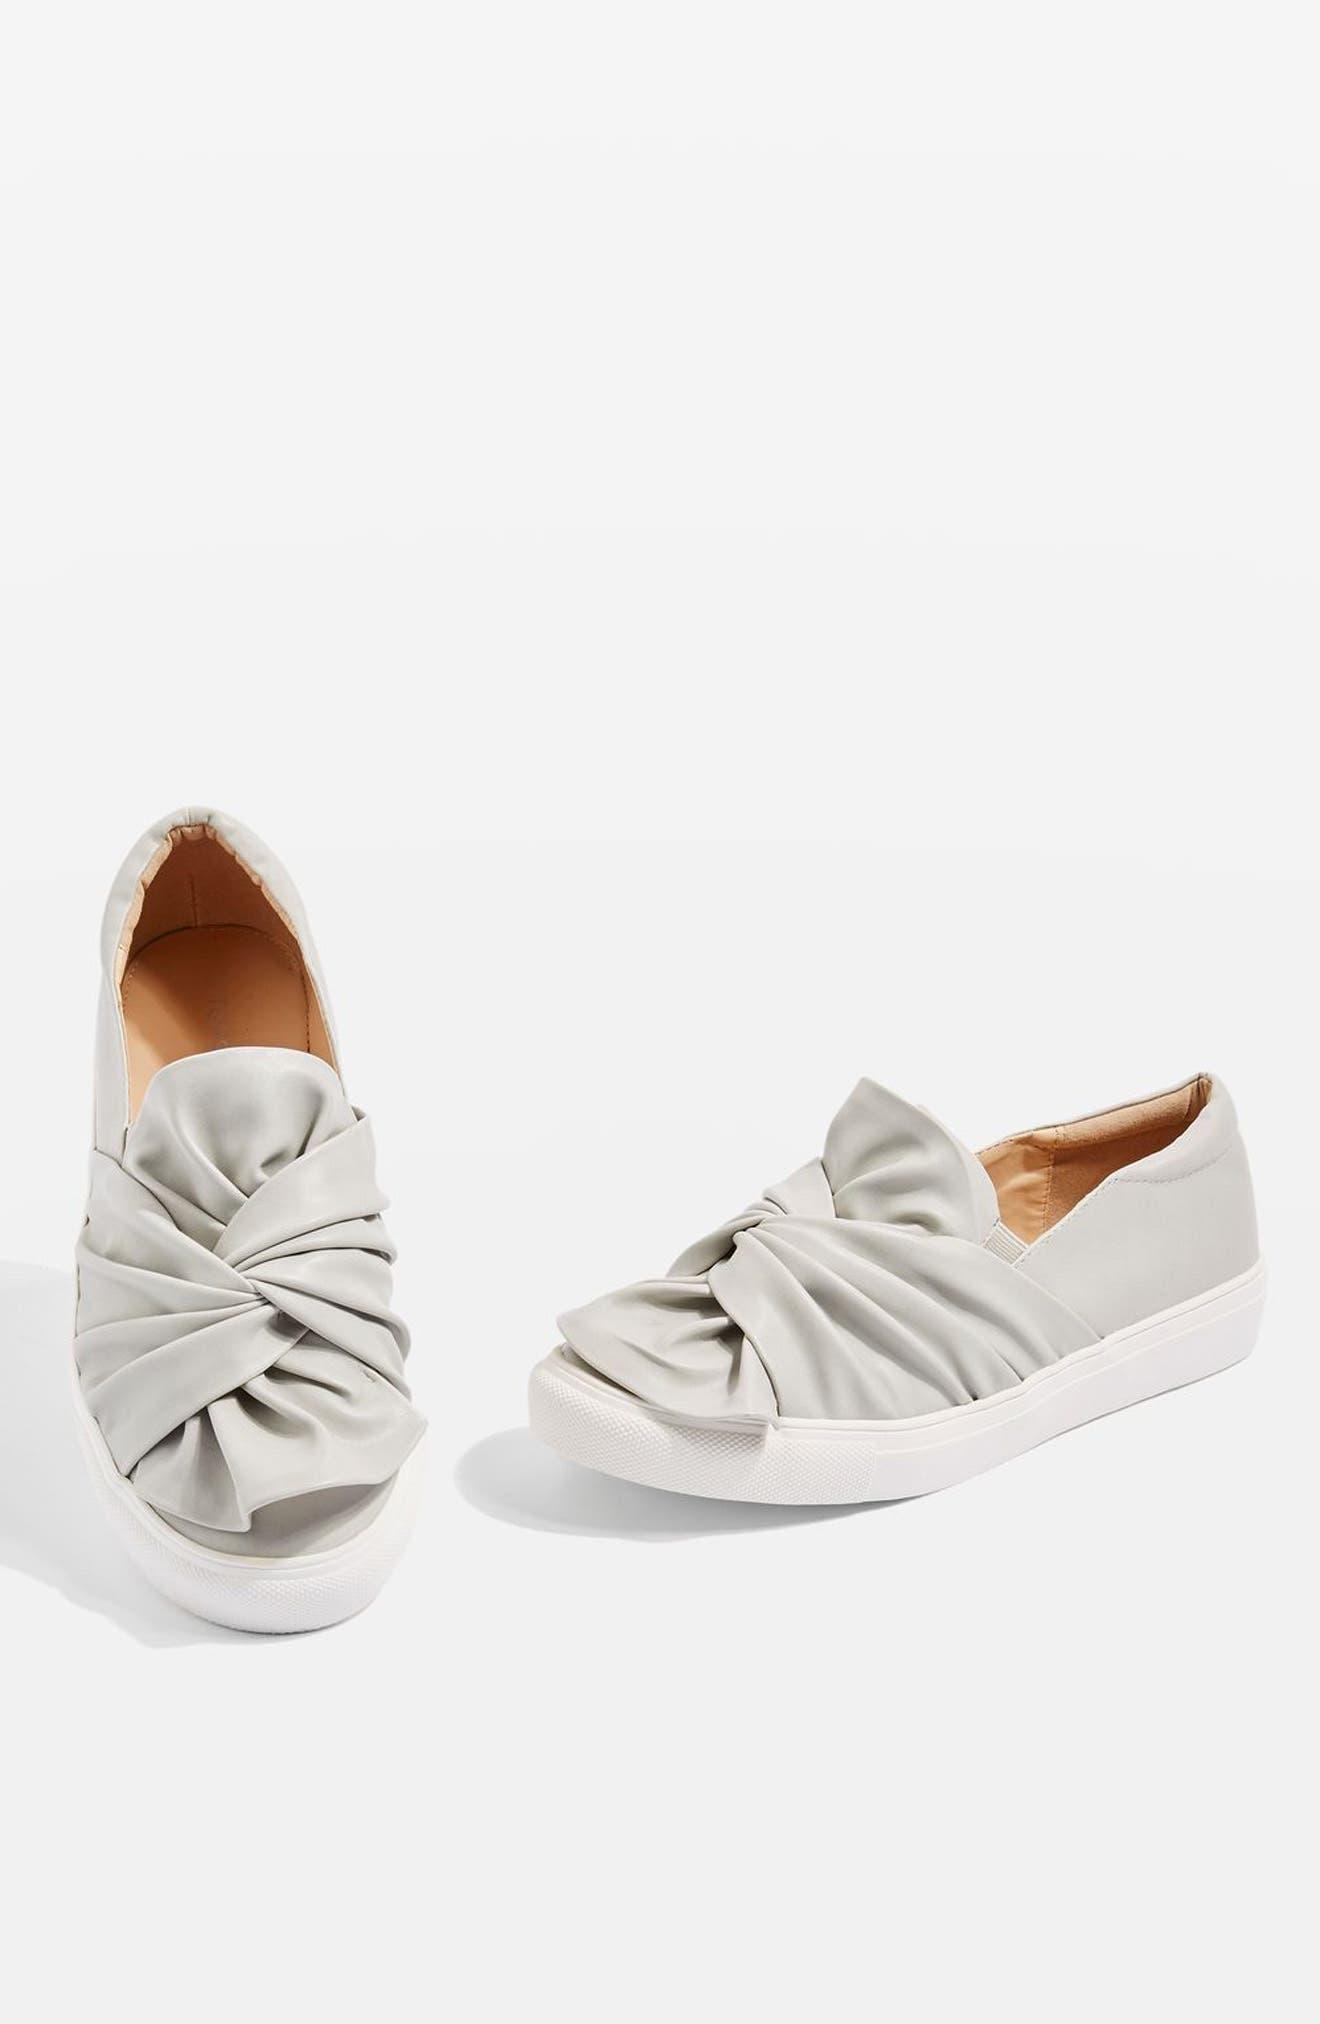 Topshop Twisted Slip-On Sneakers